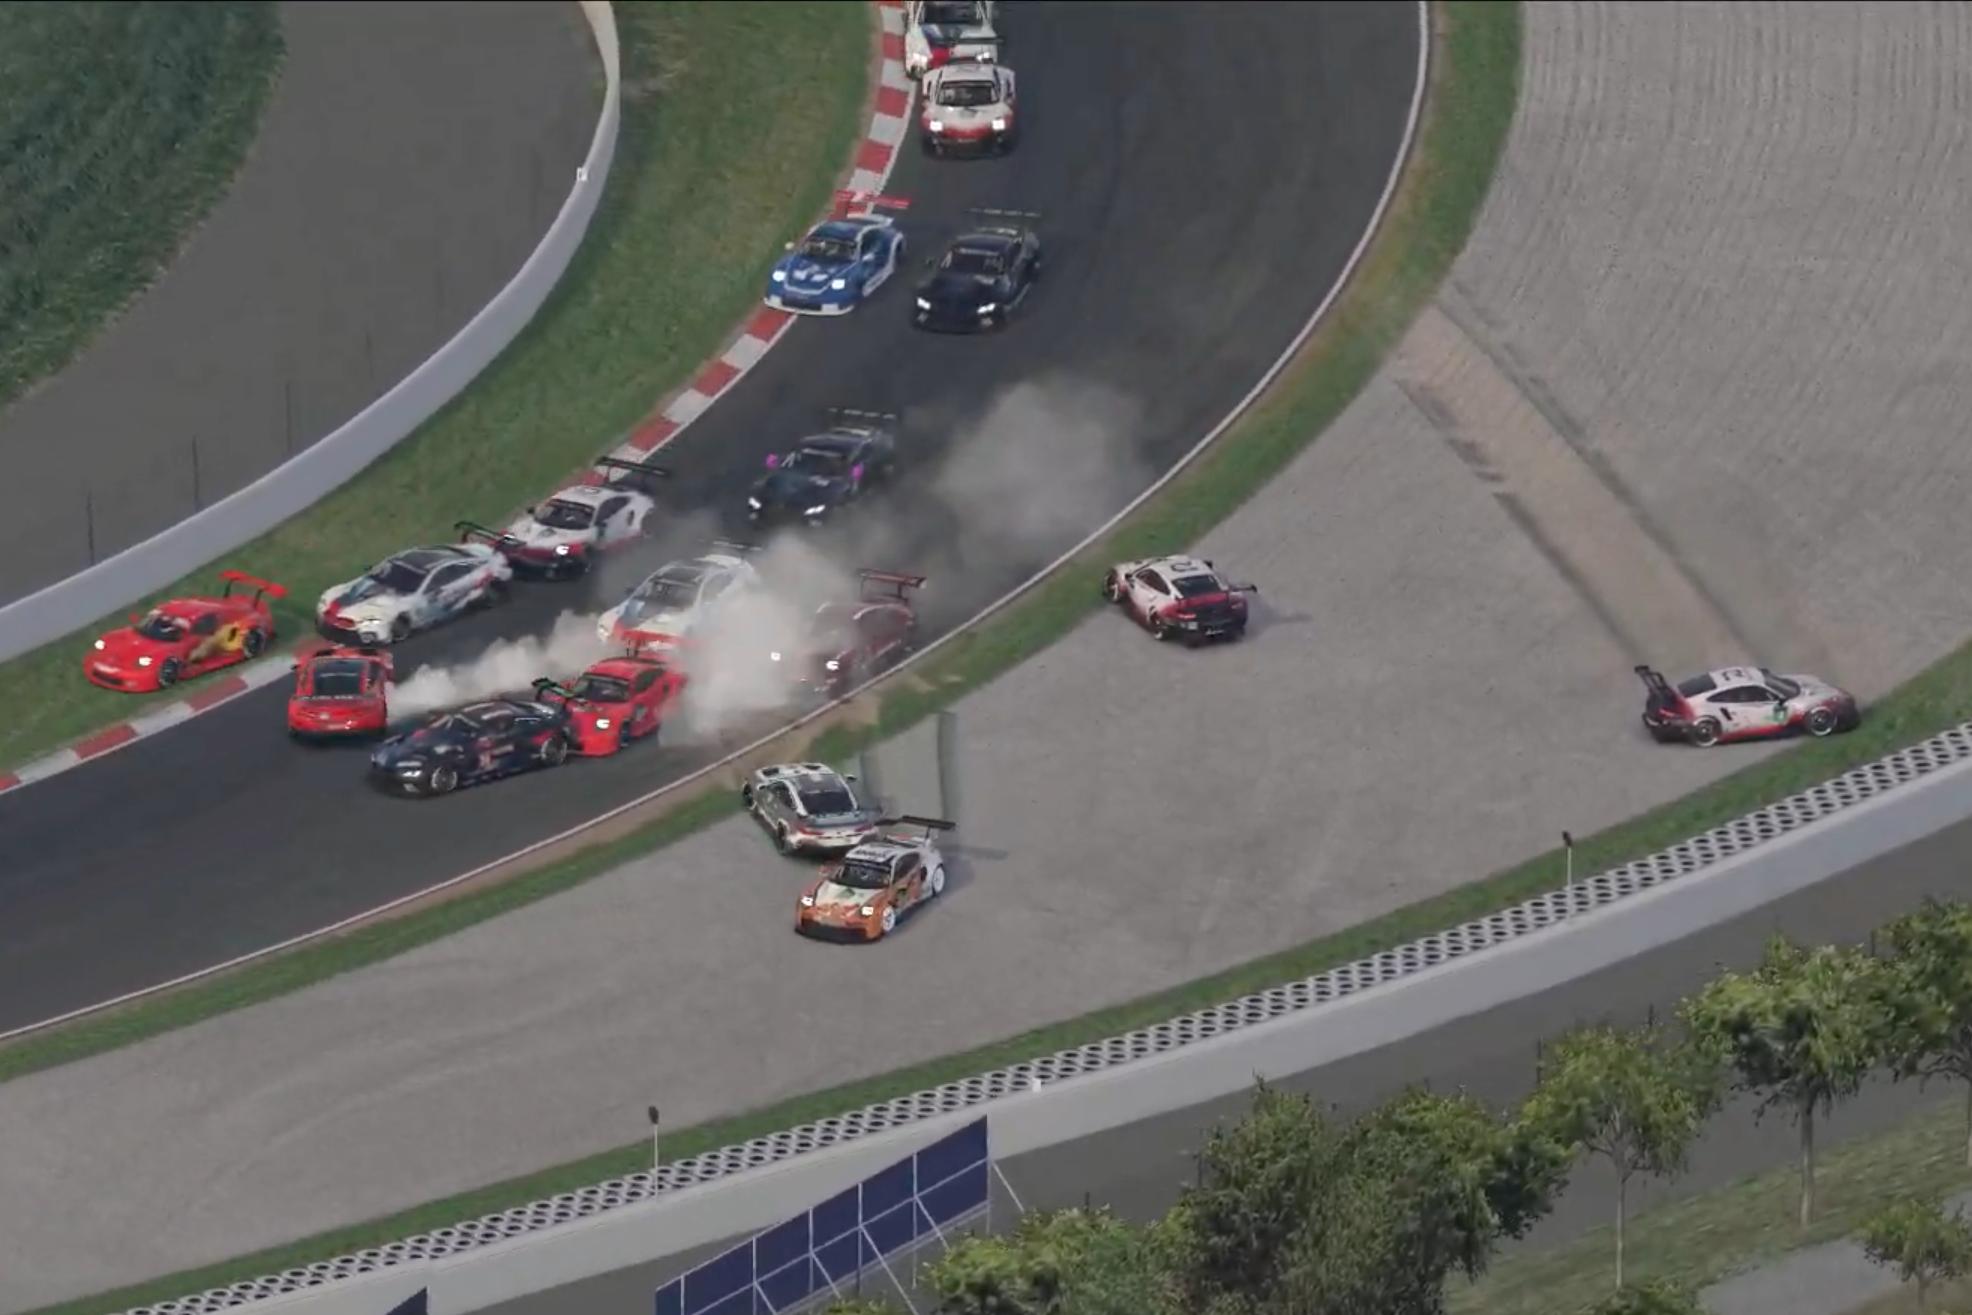 Redline R2 Second Race Crash Pic